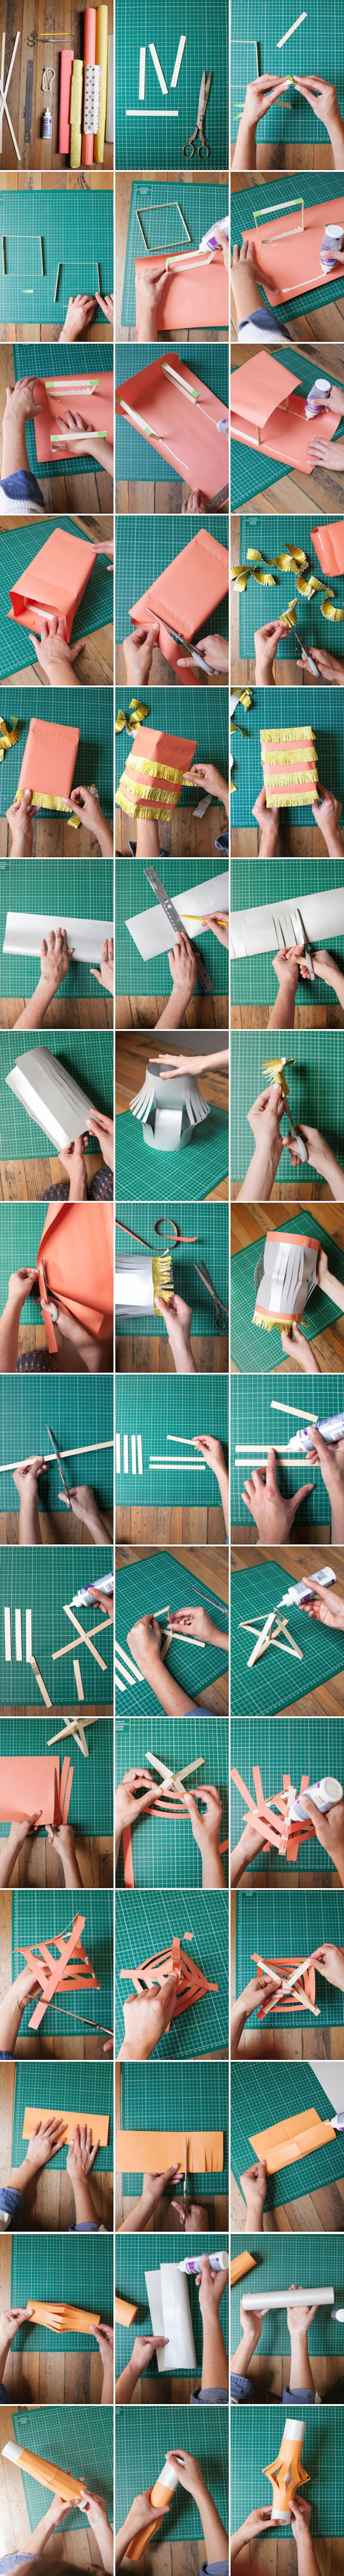 diy schritt für schritt anleitung laternen basteln mit kindern kreative bastelideen